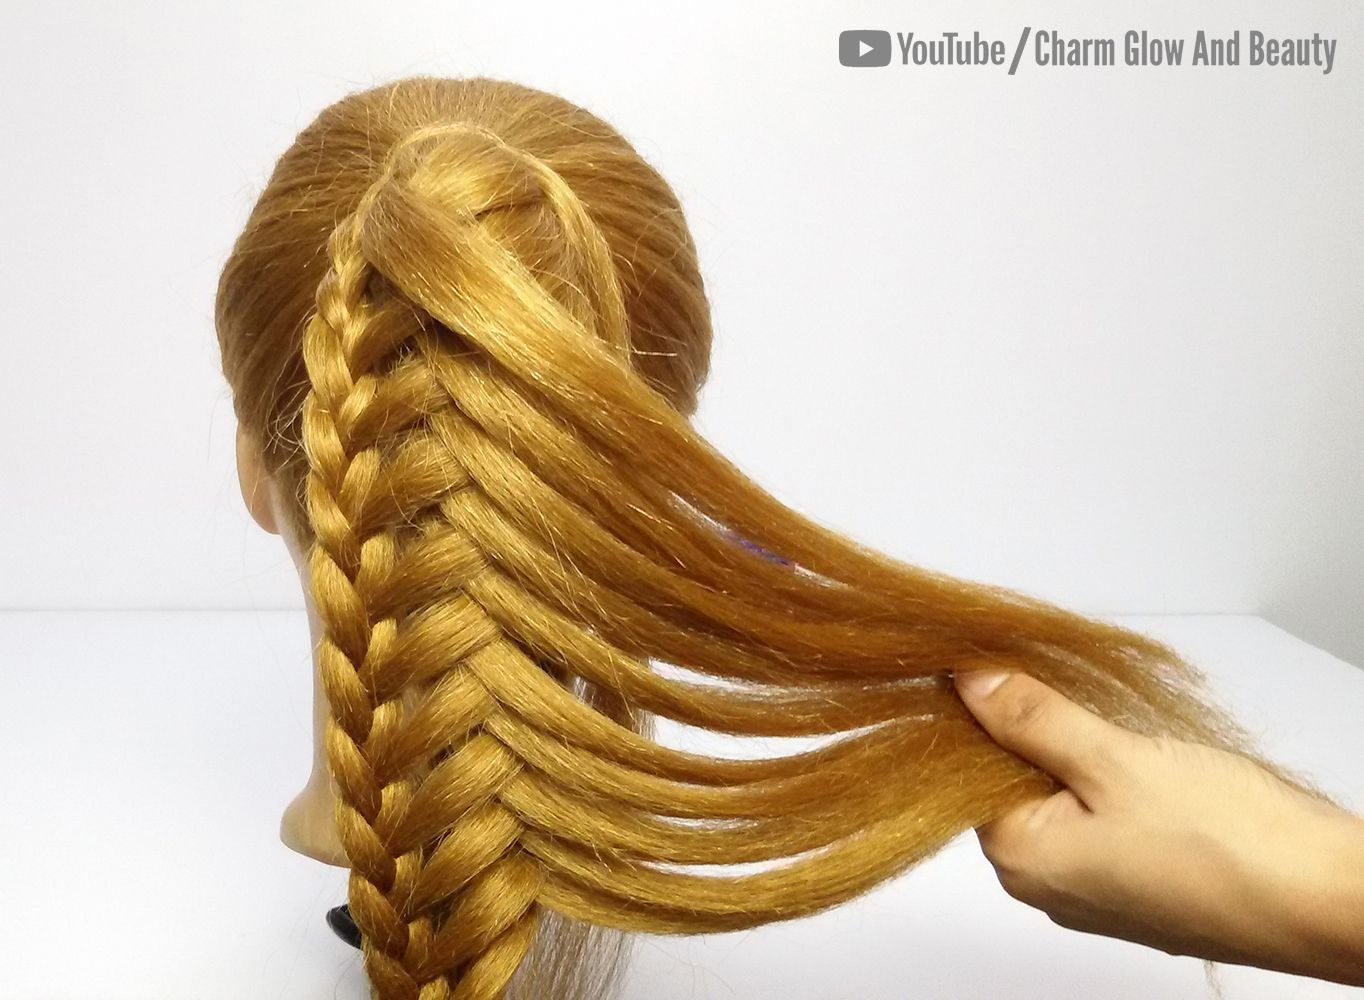 Super Easy Hairstyles Hacks For Girl In 2020 Hair Hacks Easy Hairstyles Braided Ponytail Hairstyles